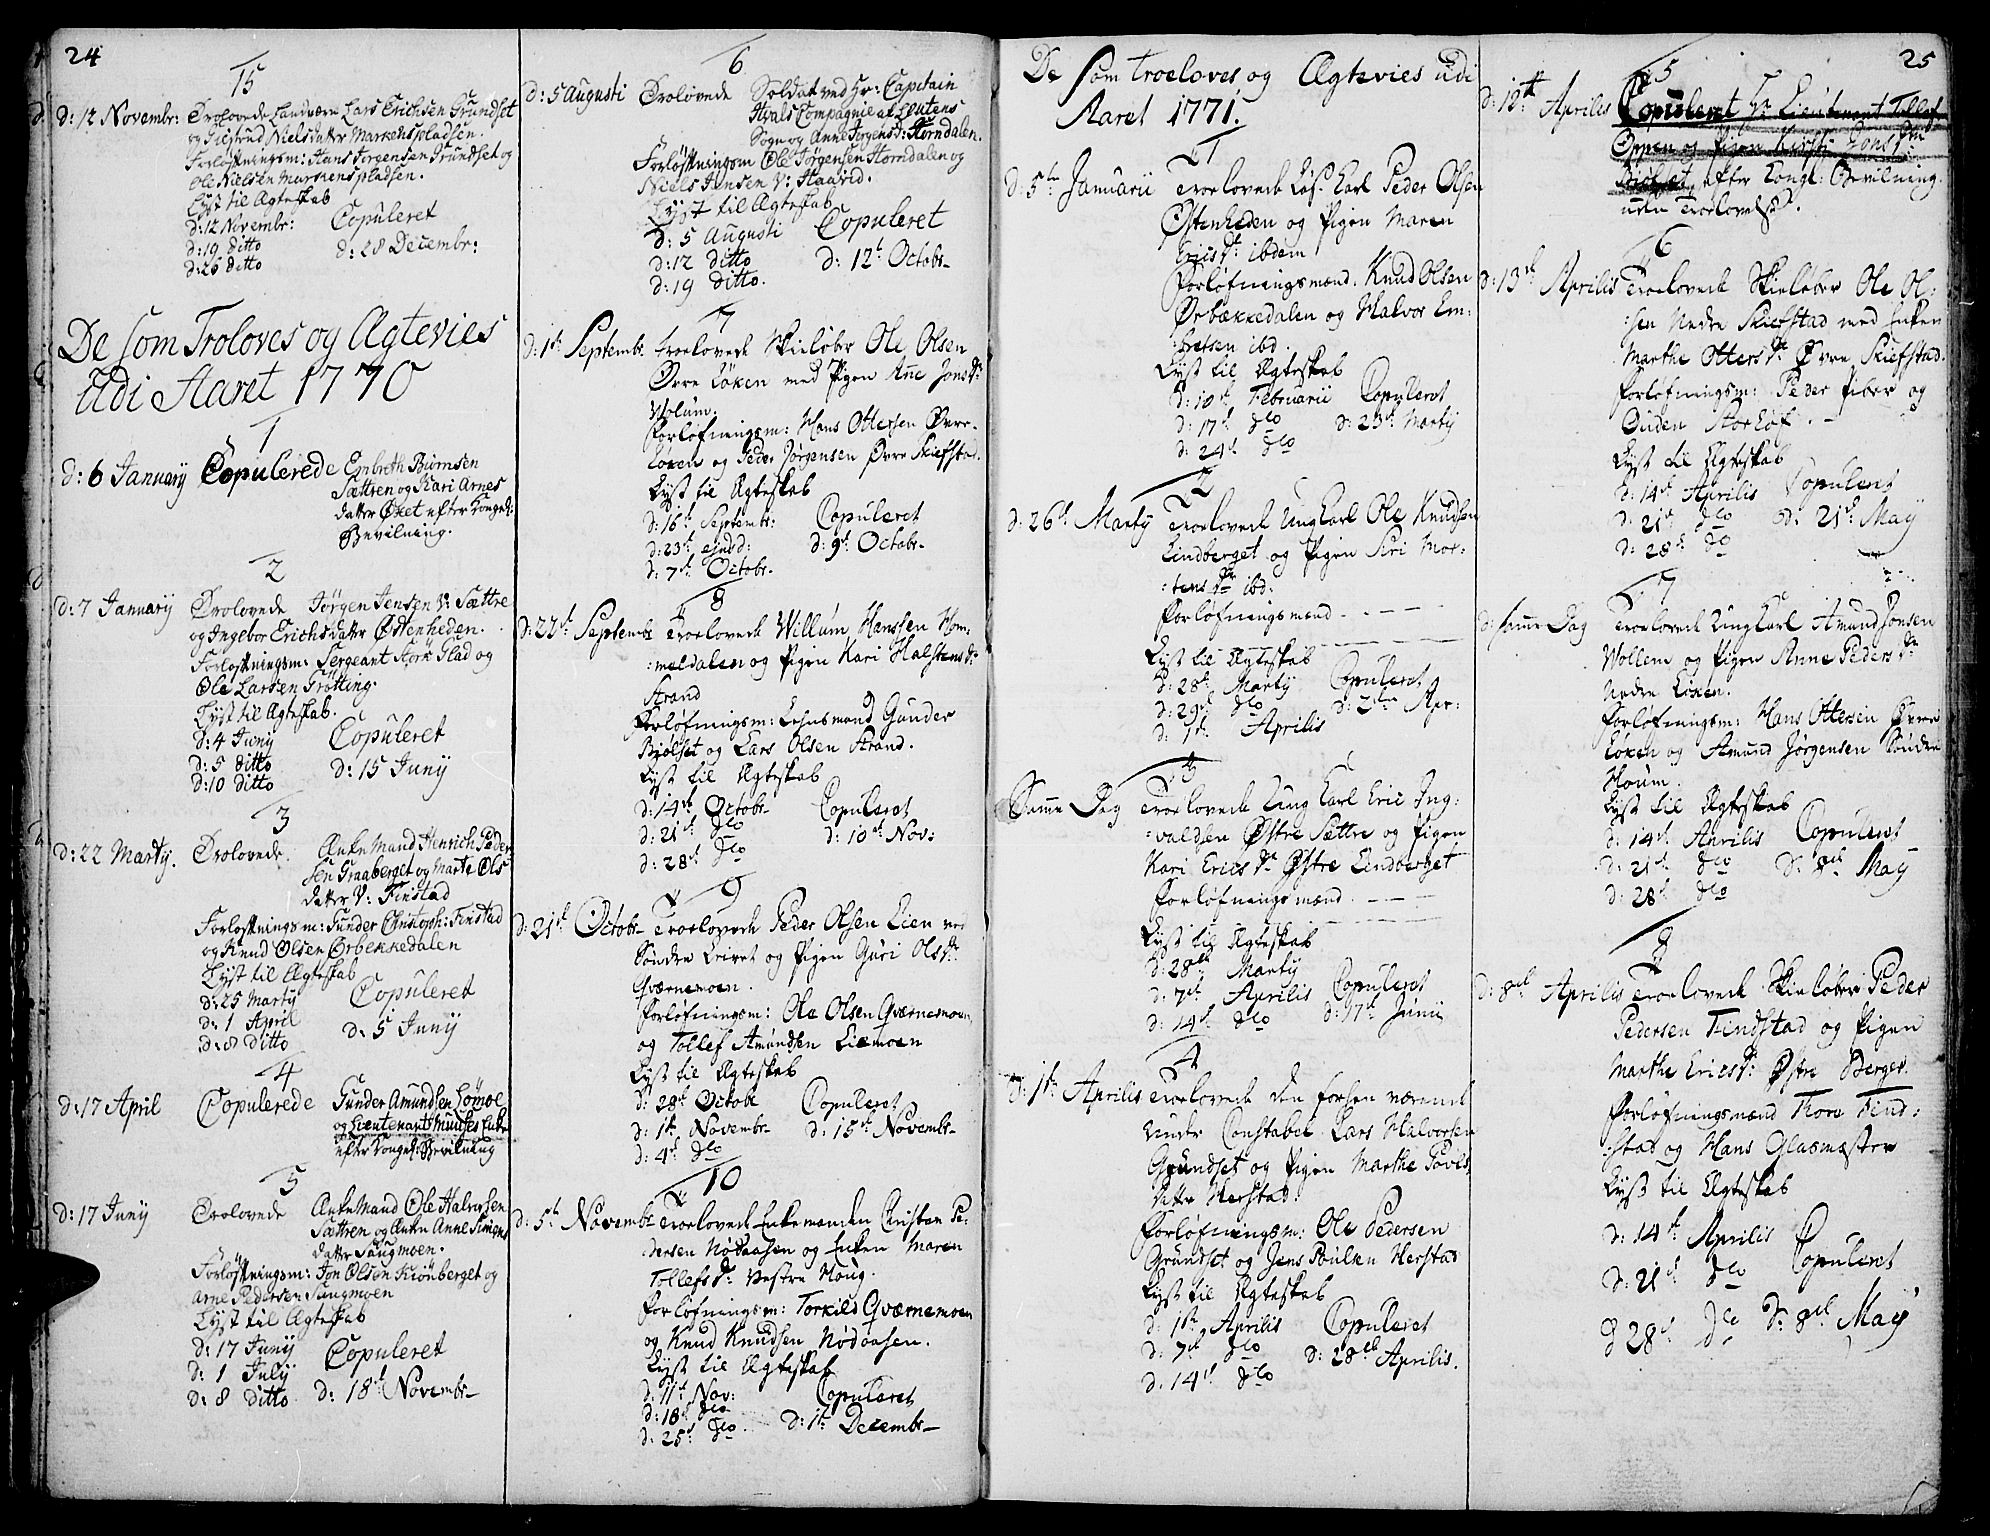 SAH, Elverum prestekontor, H/Ha/Haa/L0003: Ministerialbok nr. 3, 1757-1776, s. 24-25